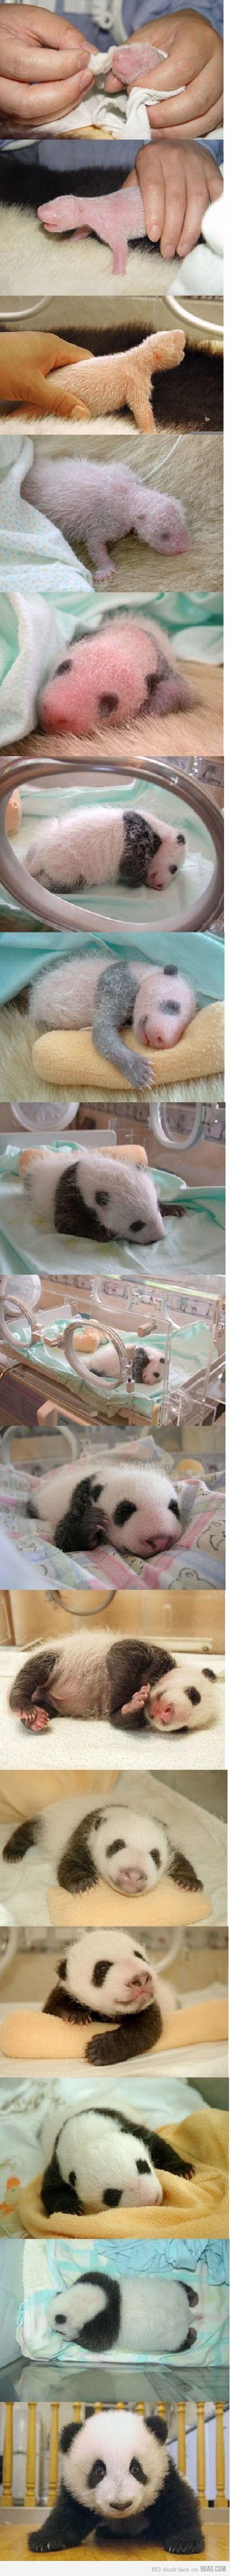 So you like pandas...